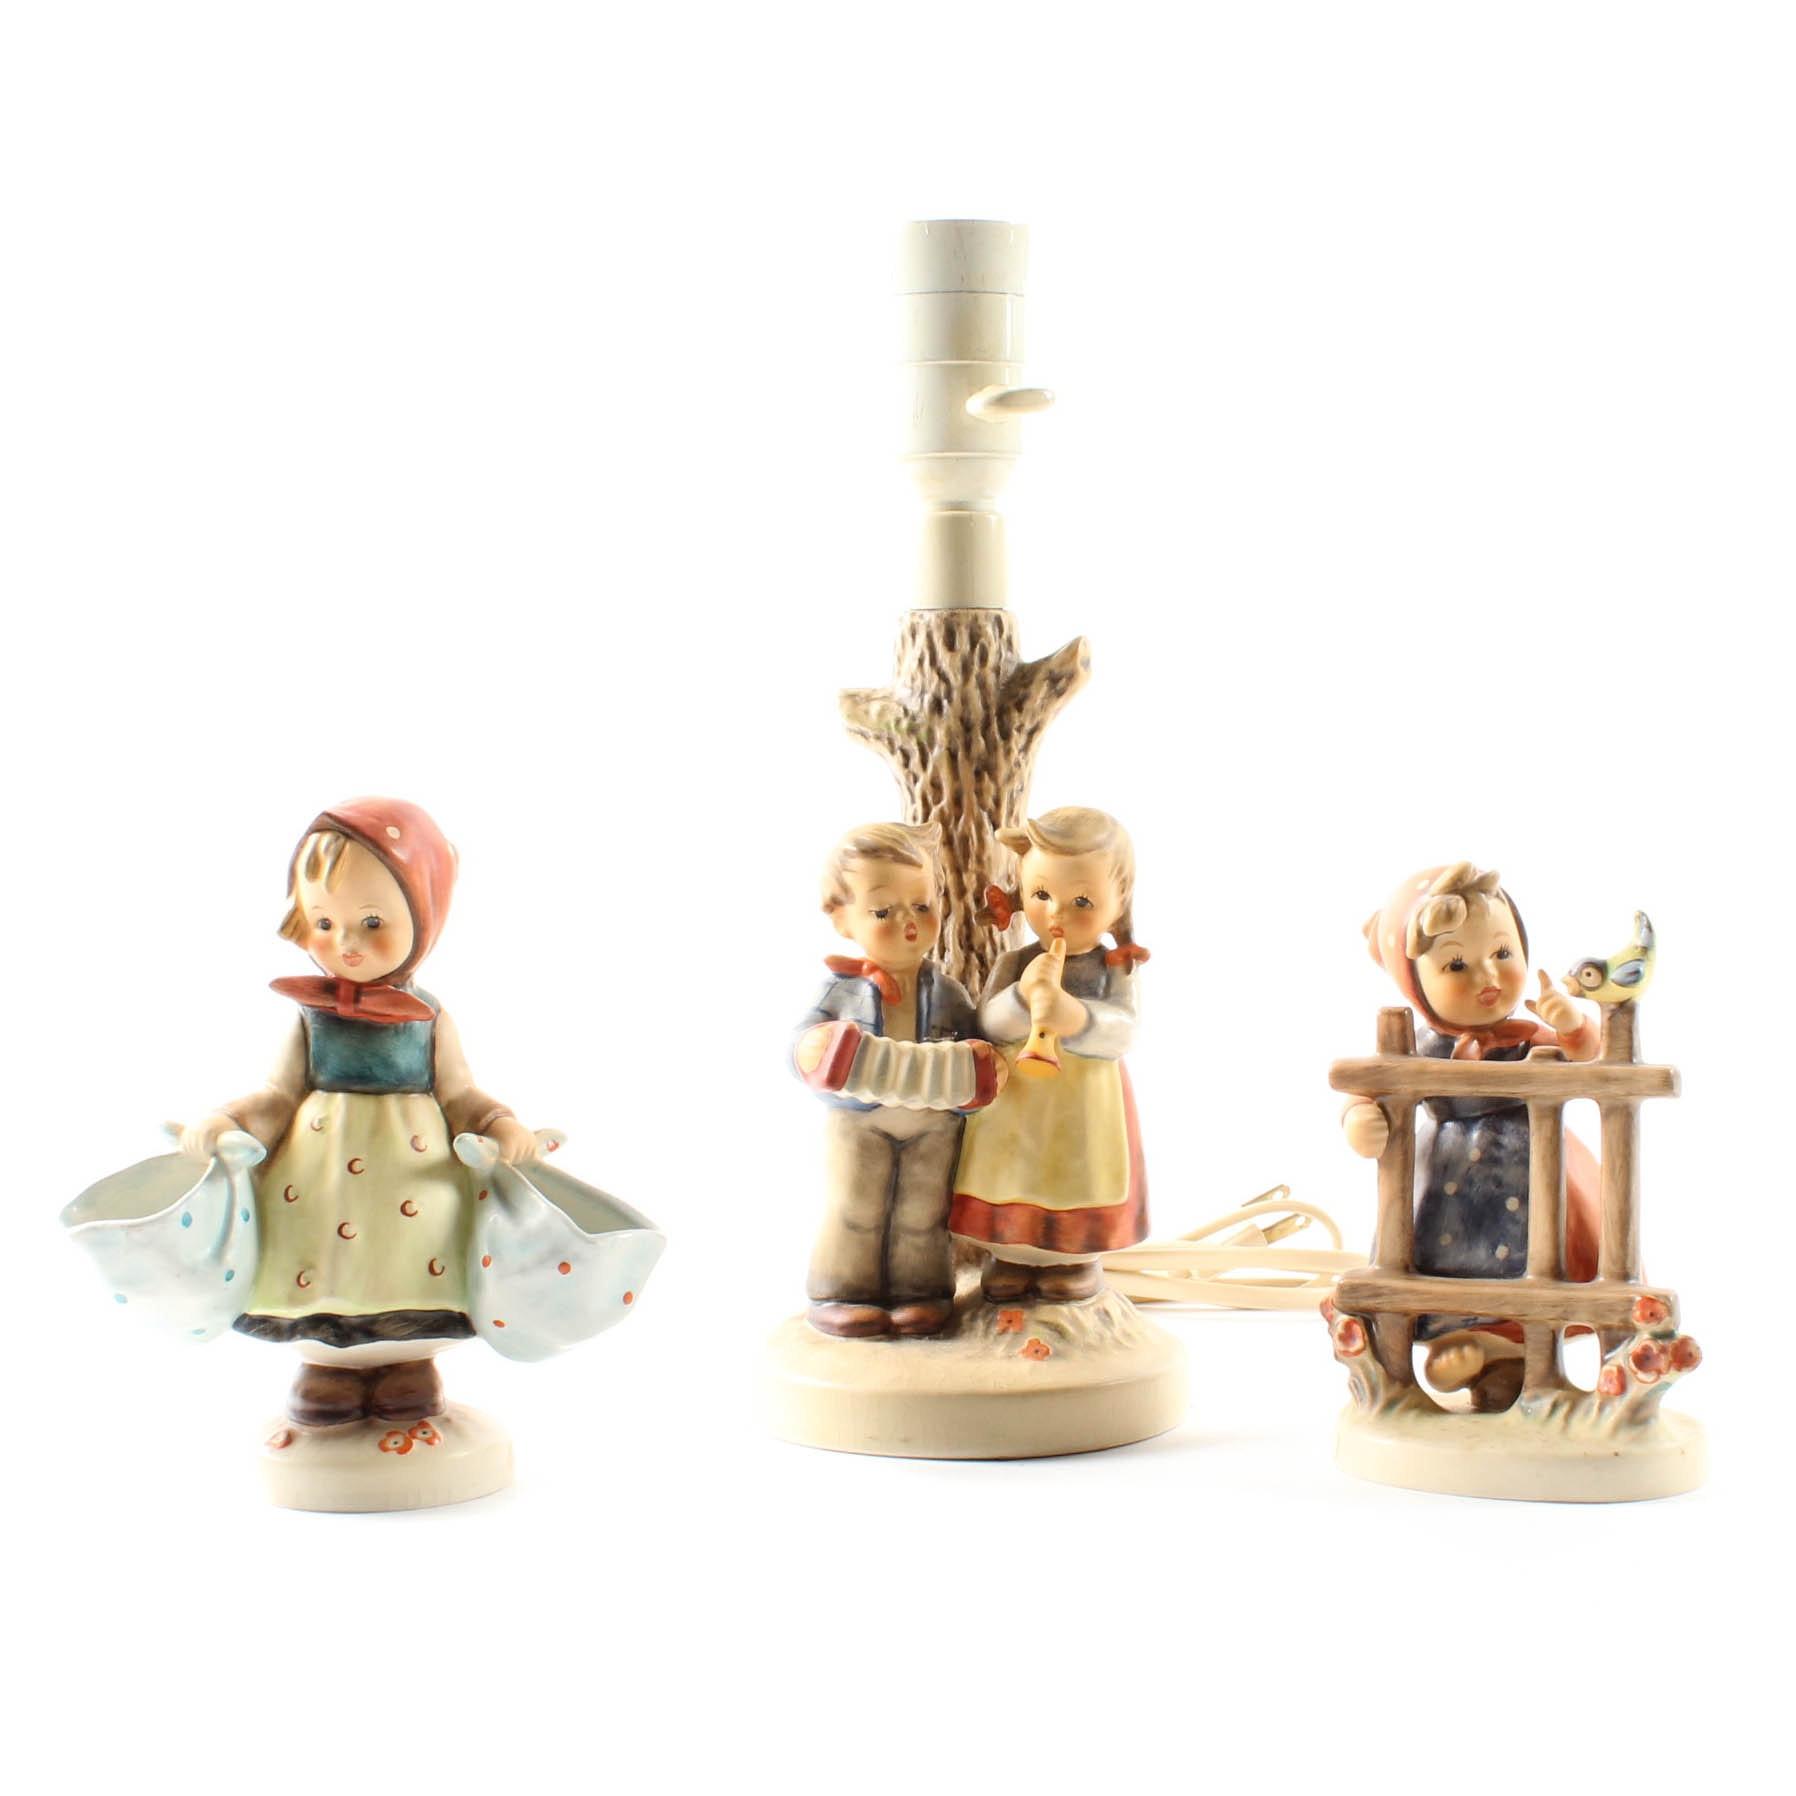 M. J. Hummel Desk Lamp and Figurines